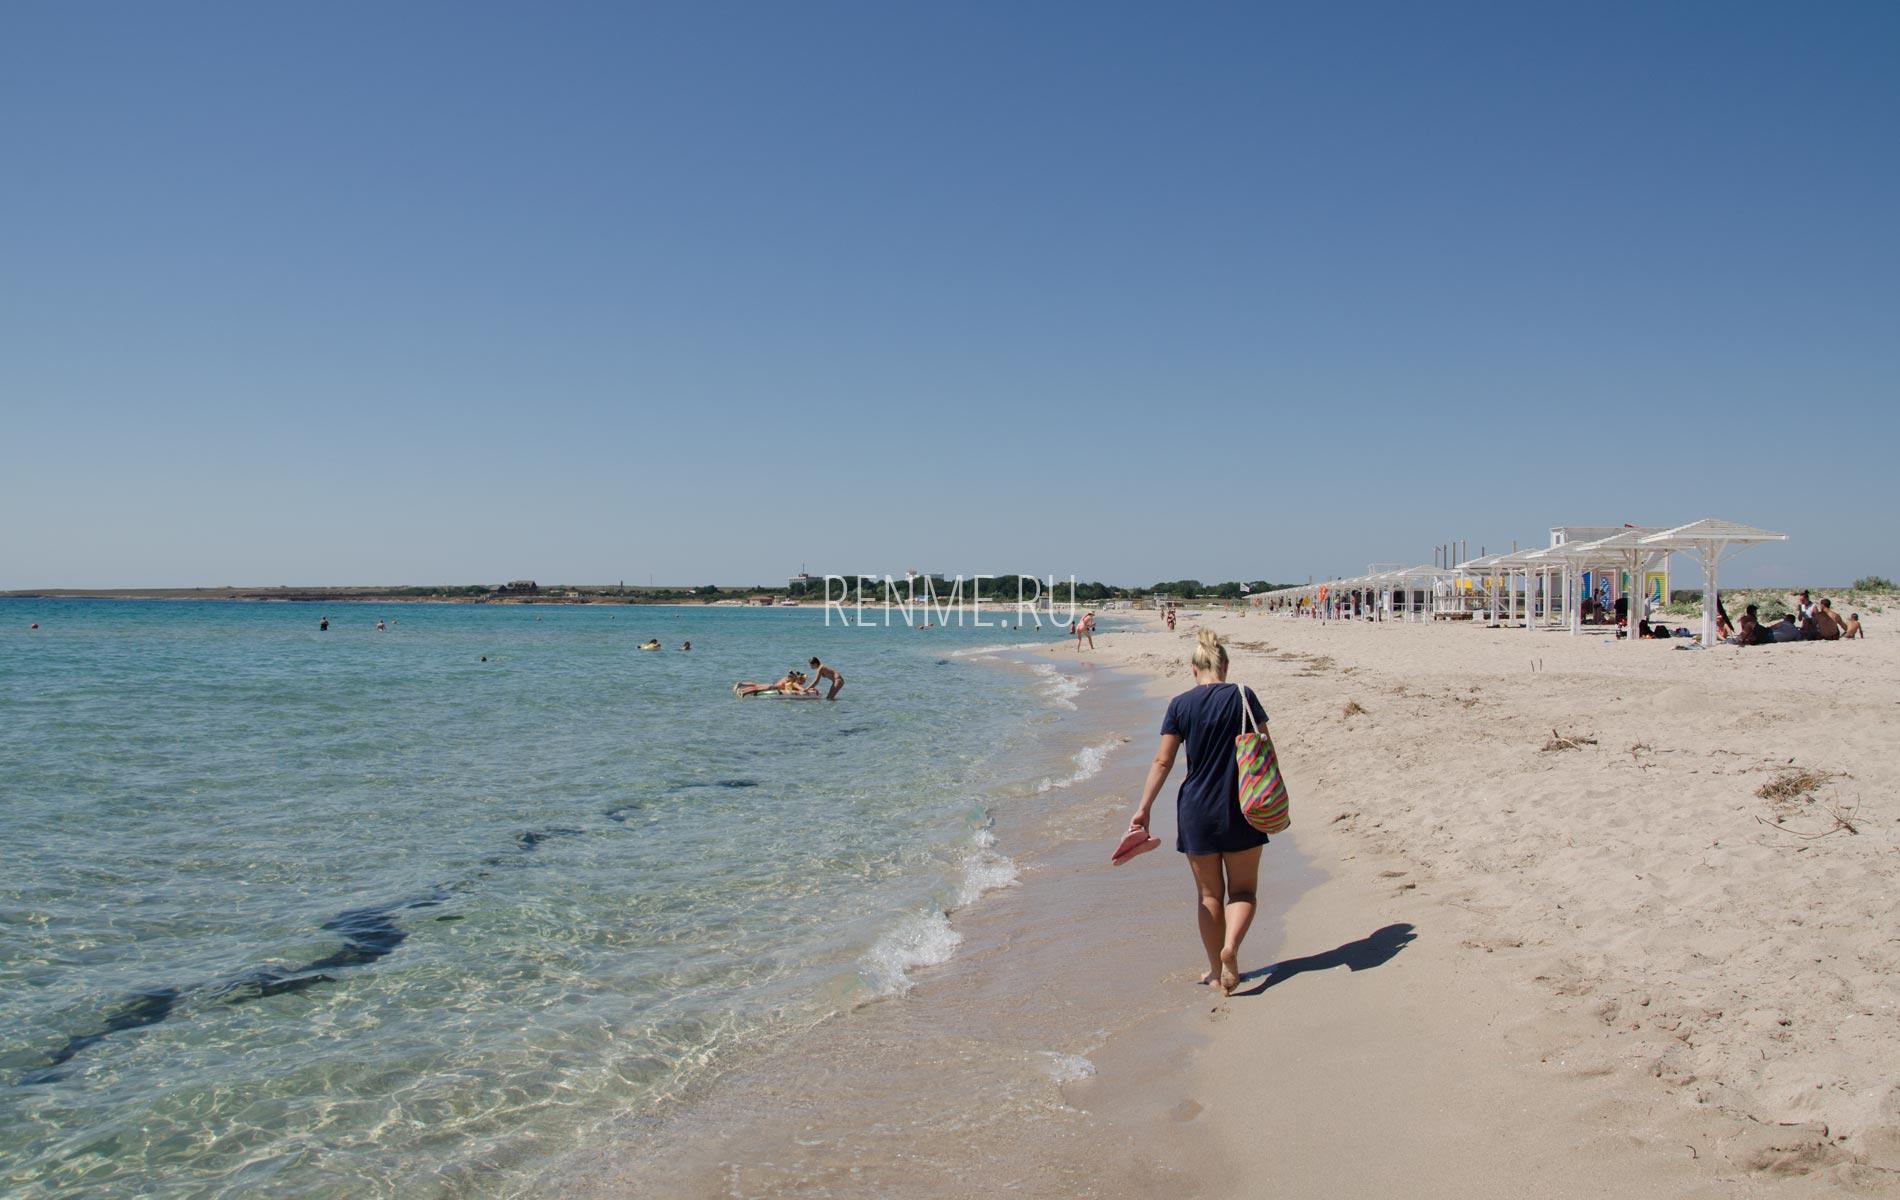 Поселок Оленевка, фото пляжа в июне. Фото Оленевки